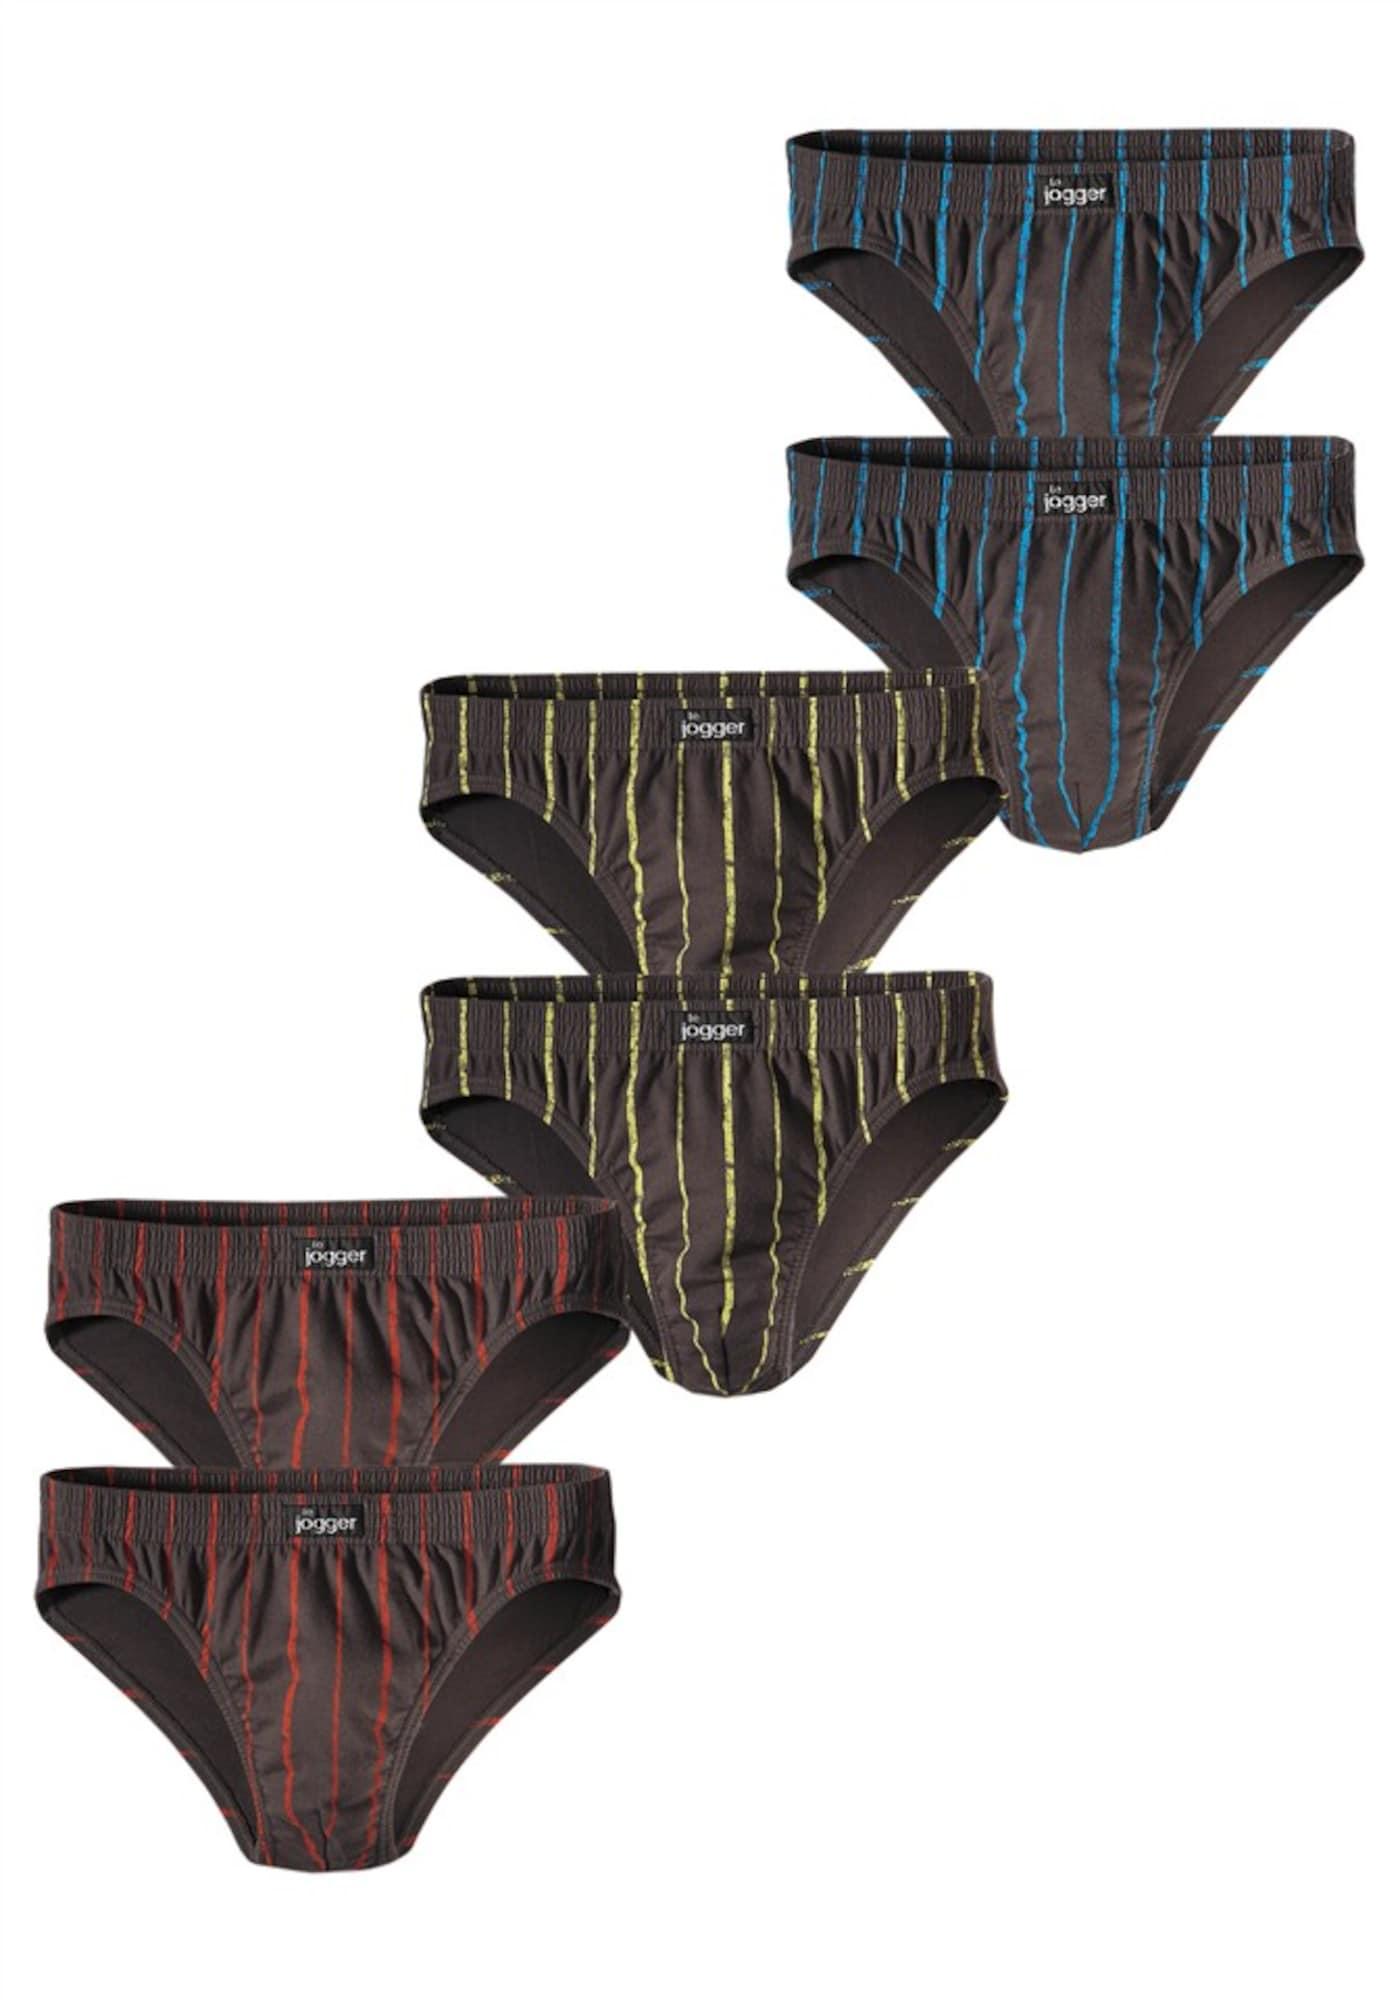 LE JOGGER Vyriškos kelnaitės mėlyna / geltona / tamsiai pilka / raudona